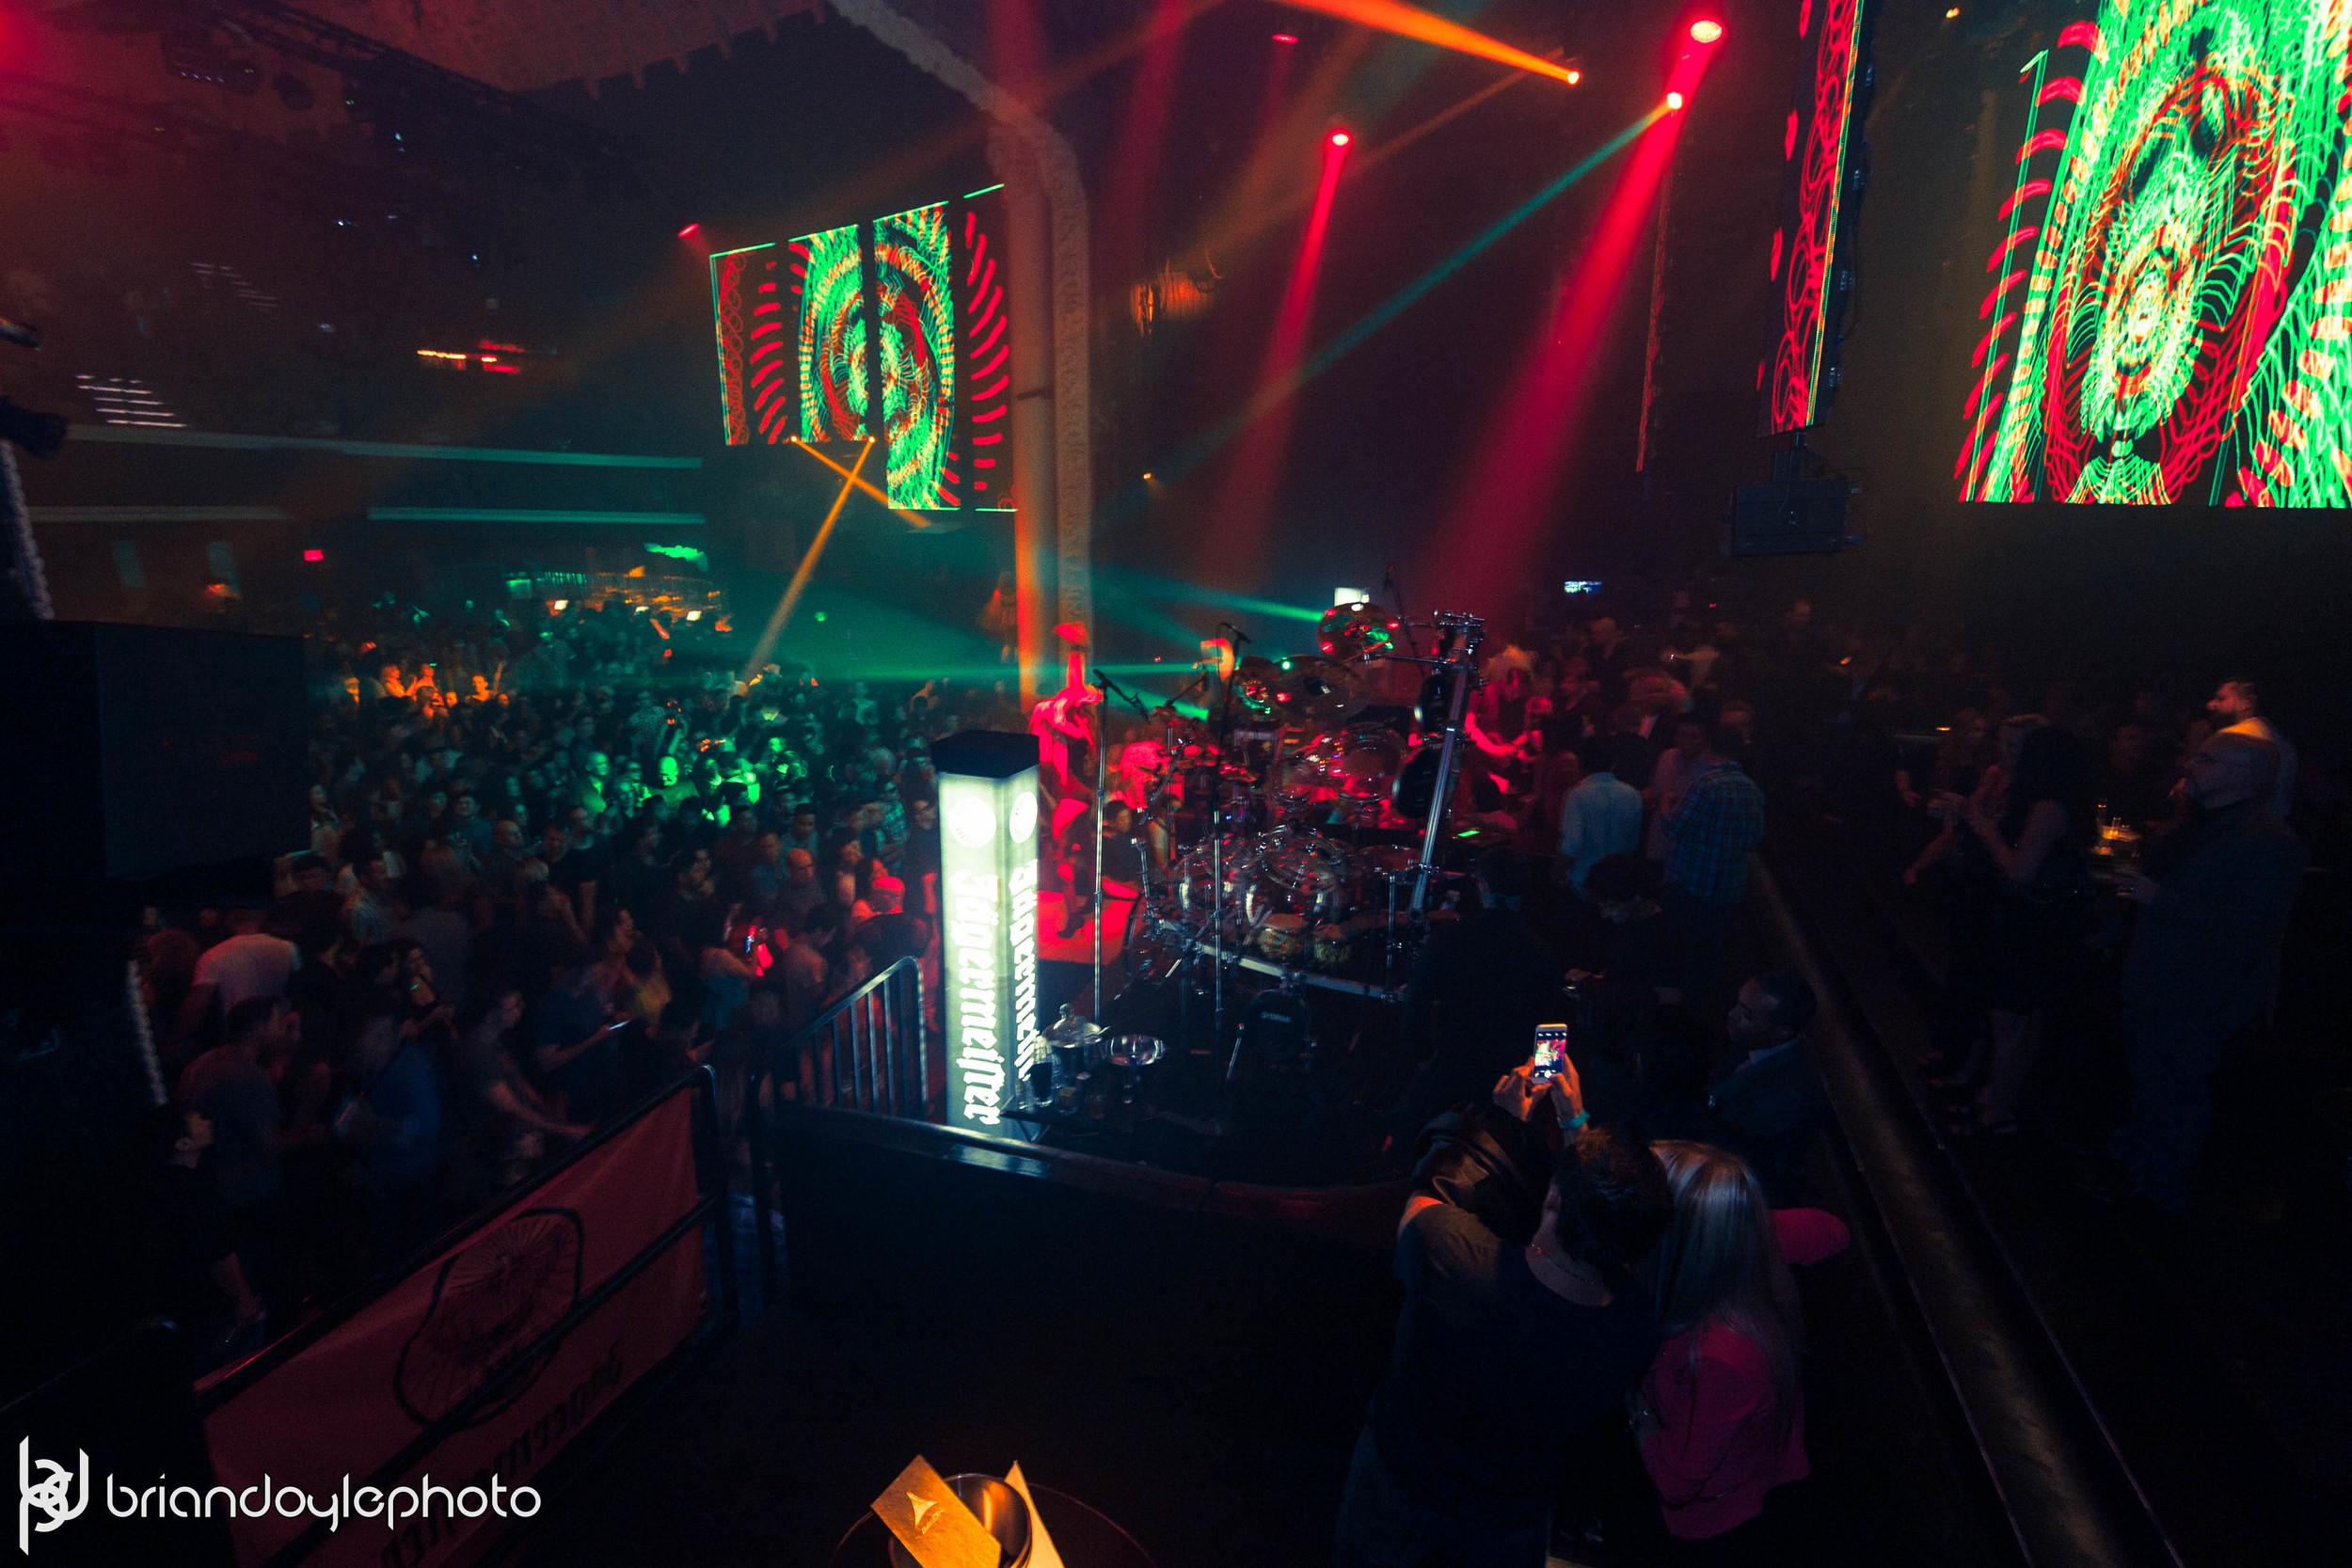 Jagermeister Presents - Paul Oakenfold @ Avalon bdp 27.09.14-23.jpg